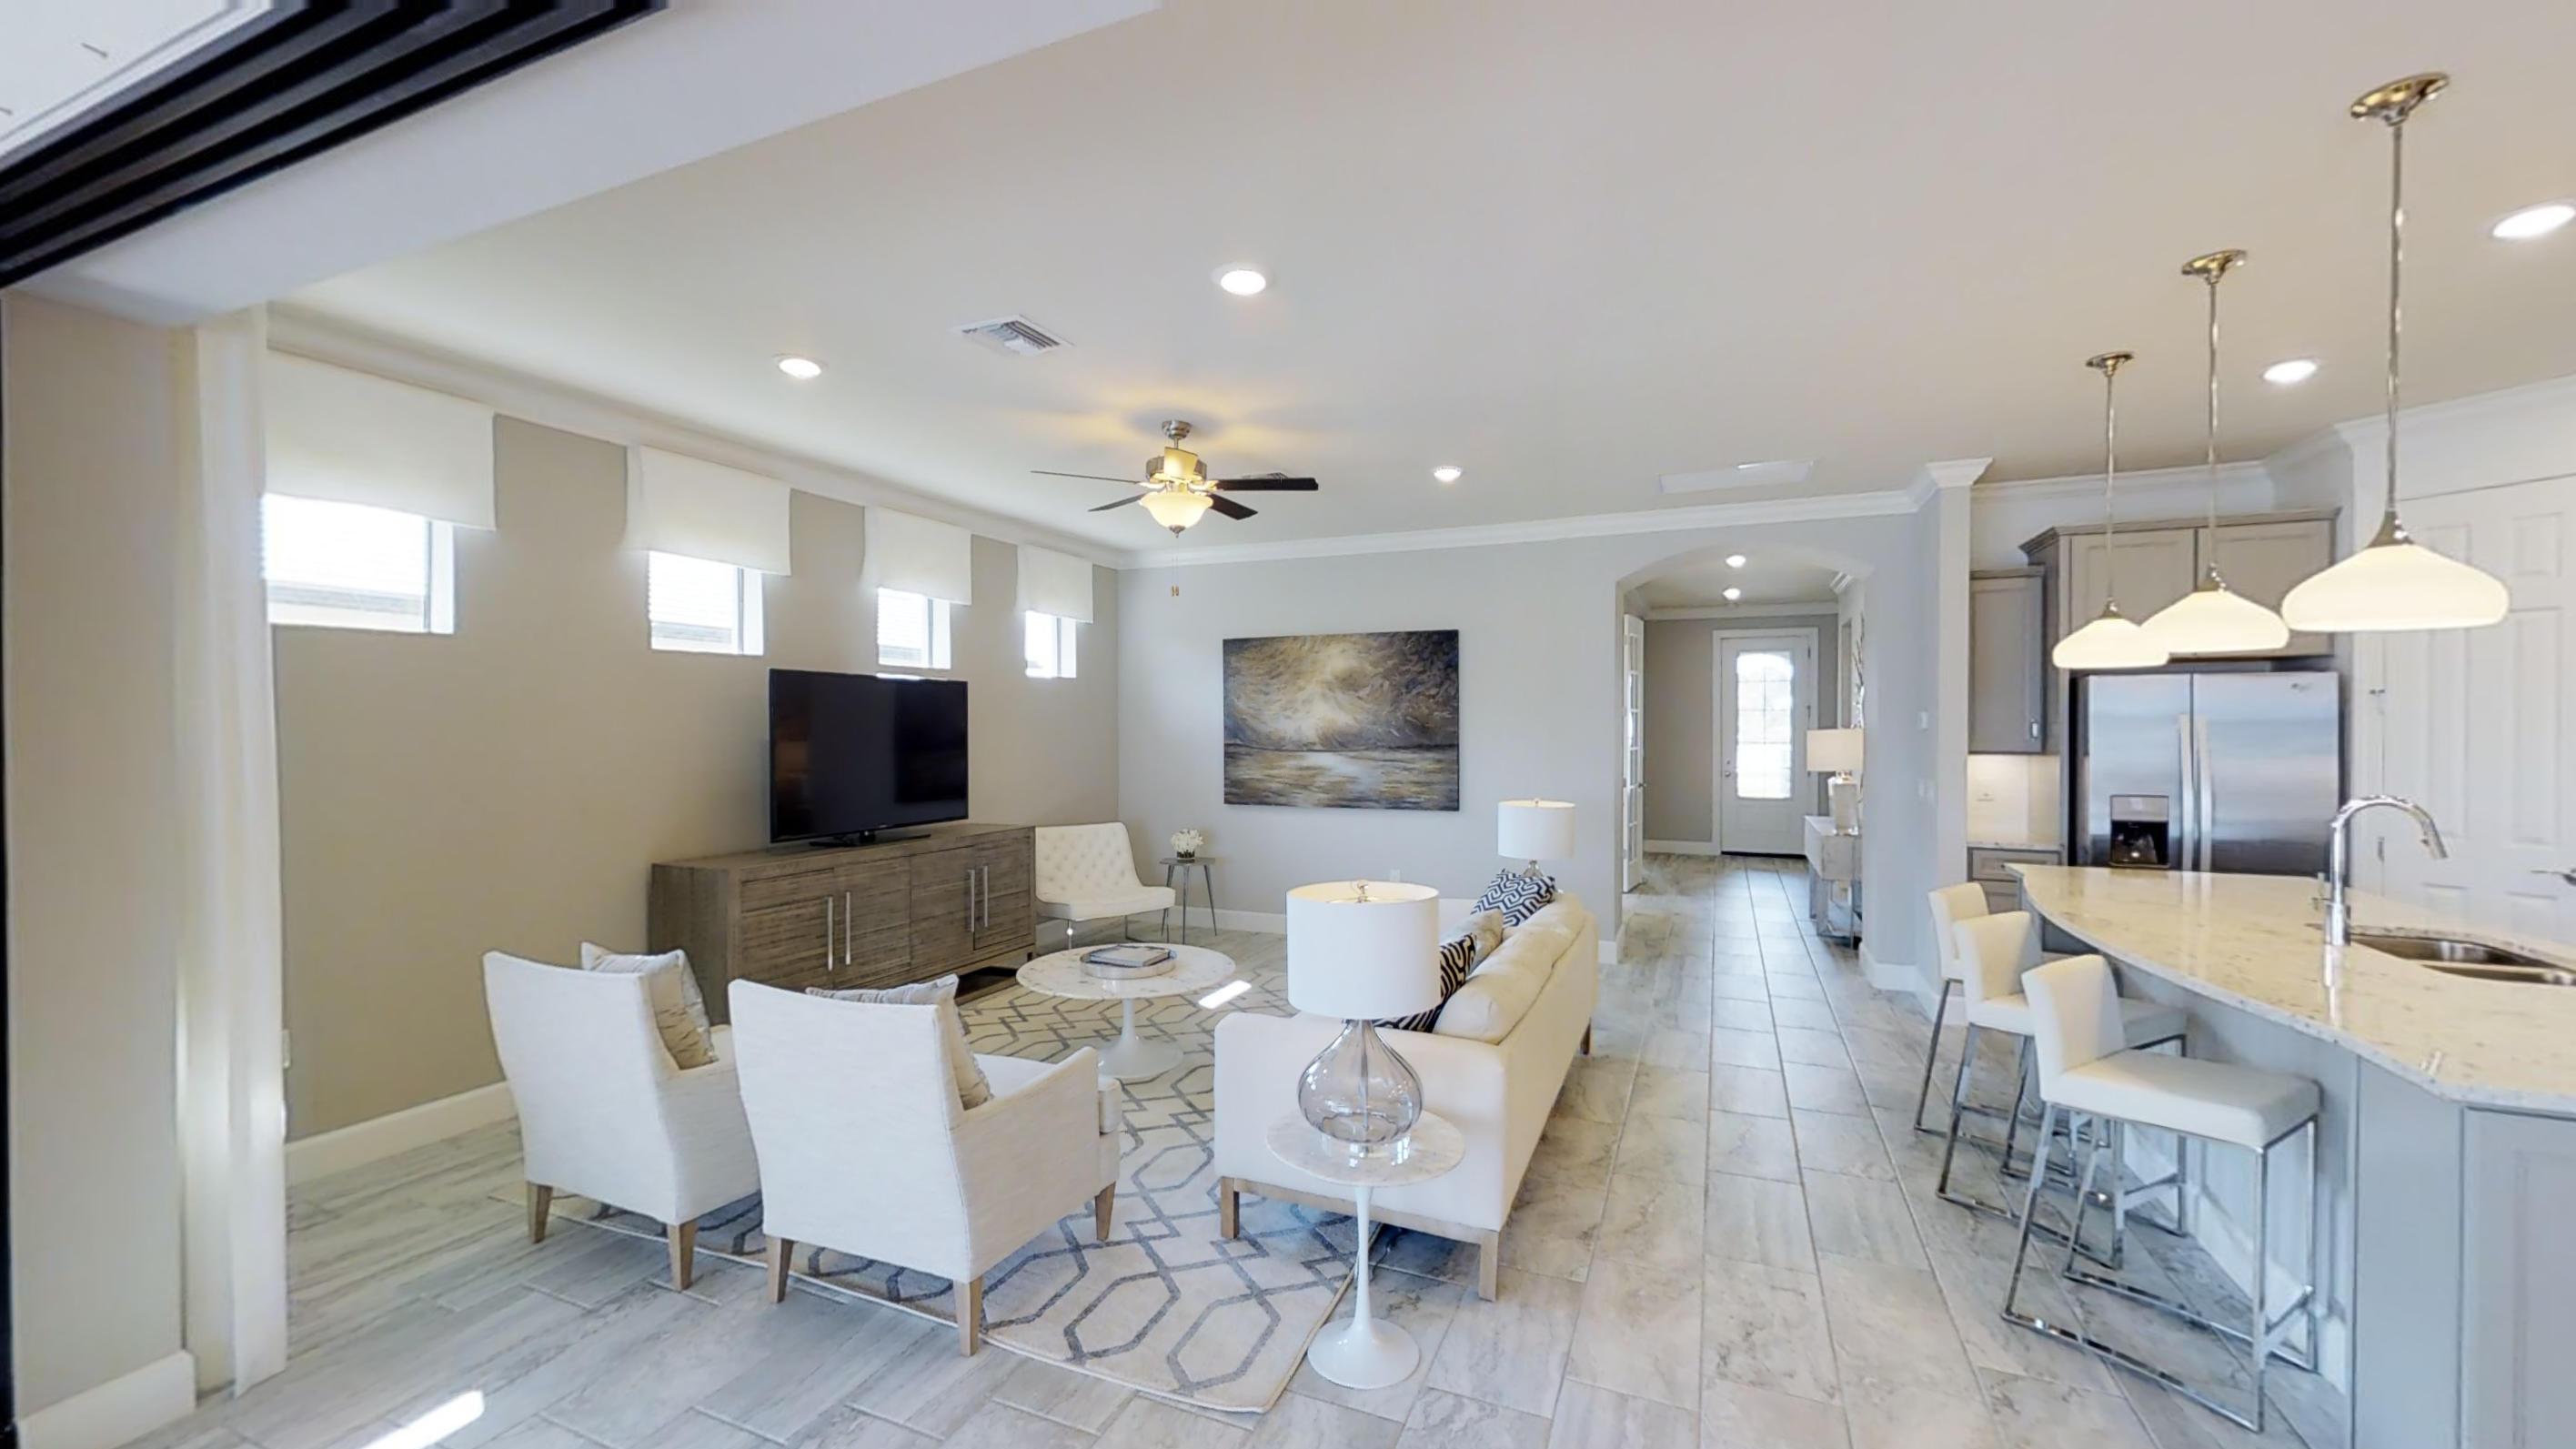 Pulte Homes: Summerwood Model